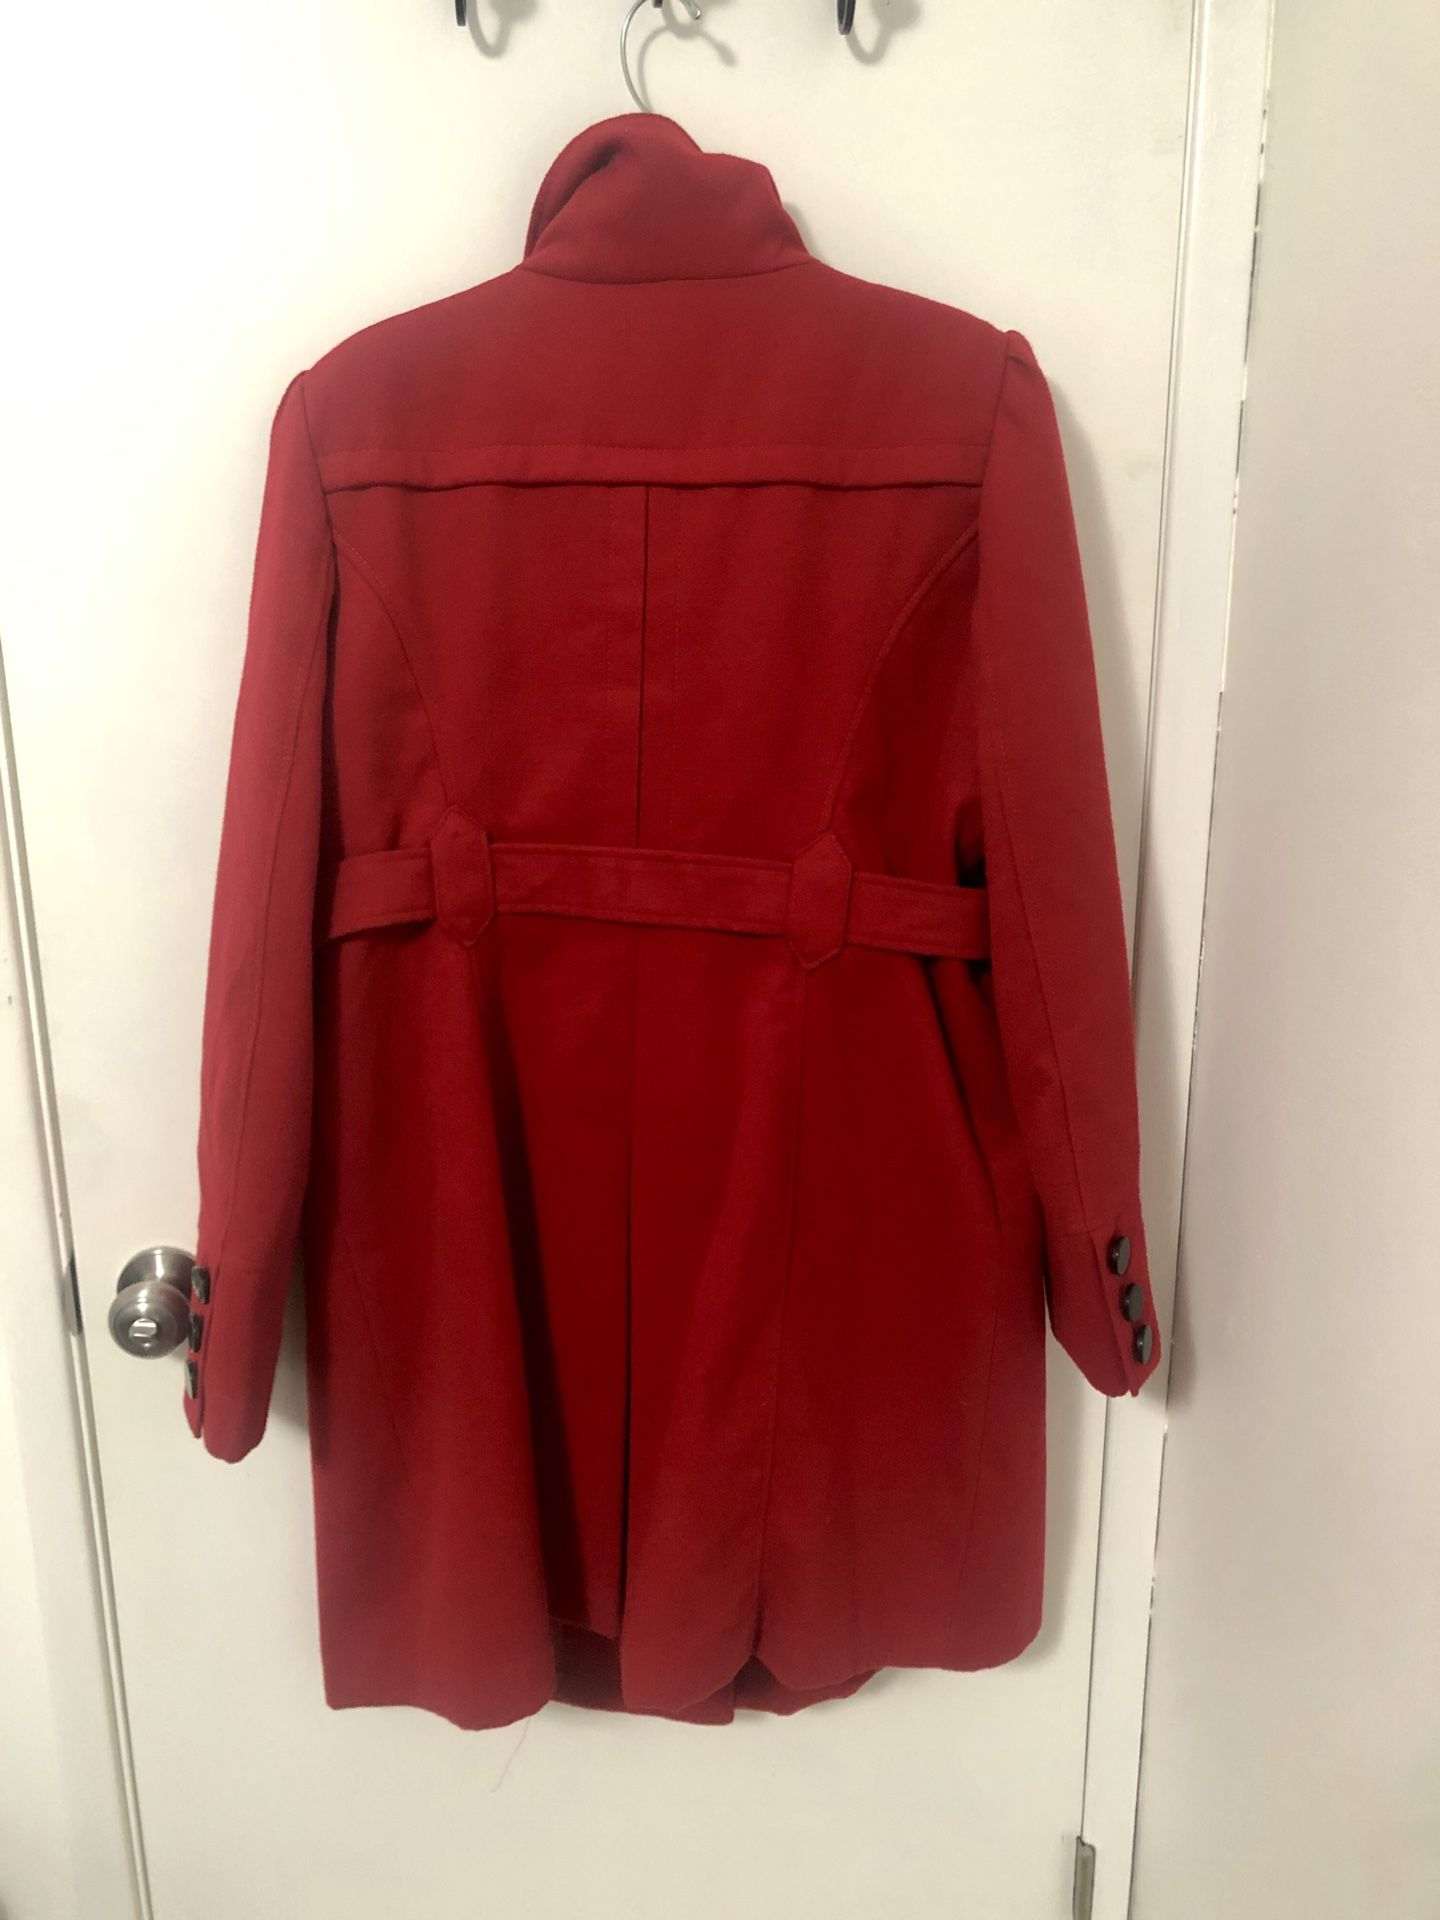 Red dress pea coat - like new!